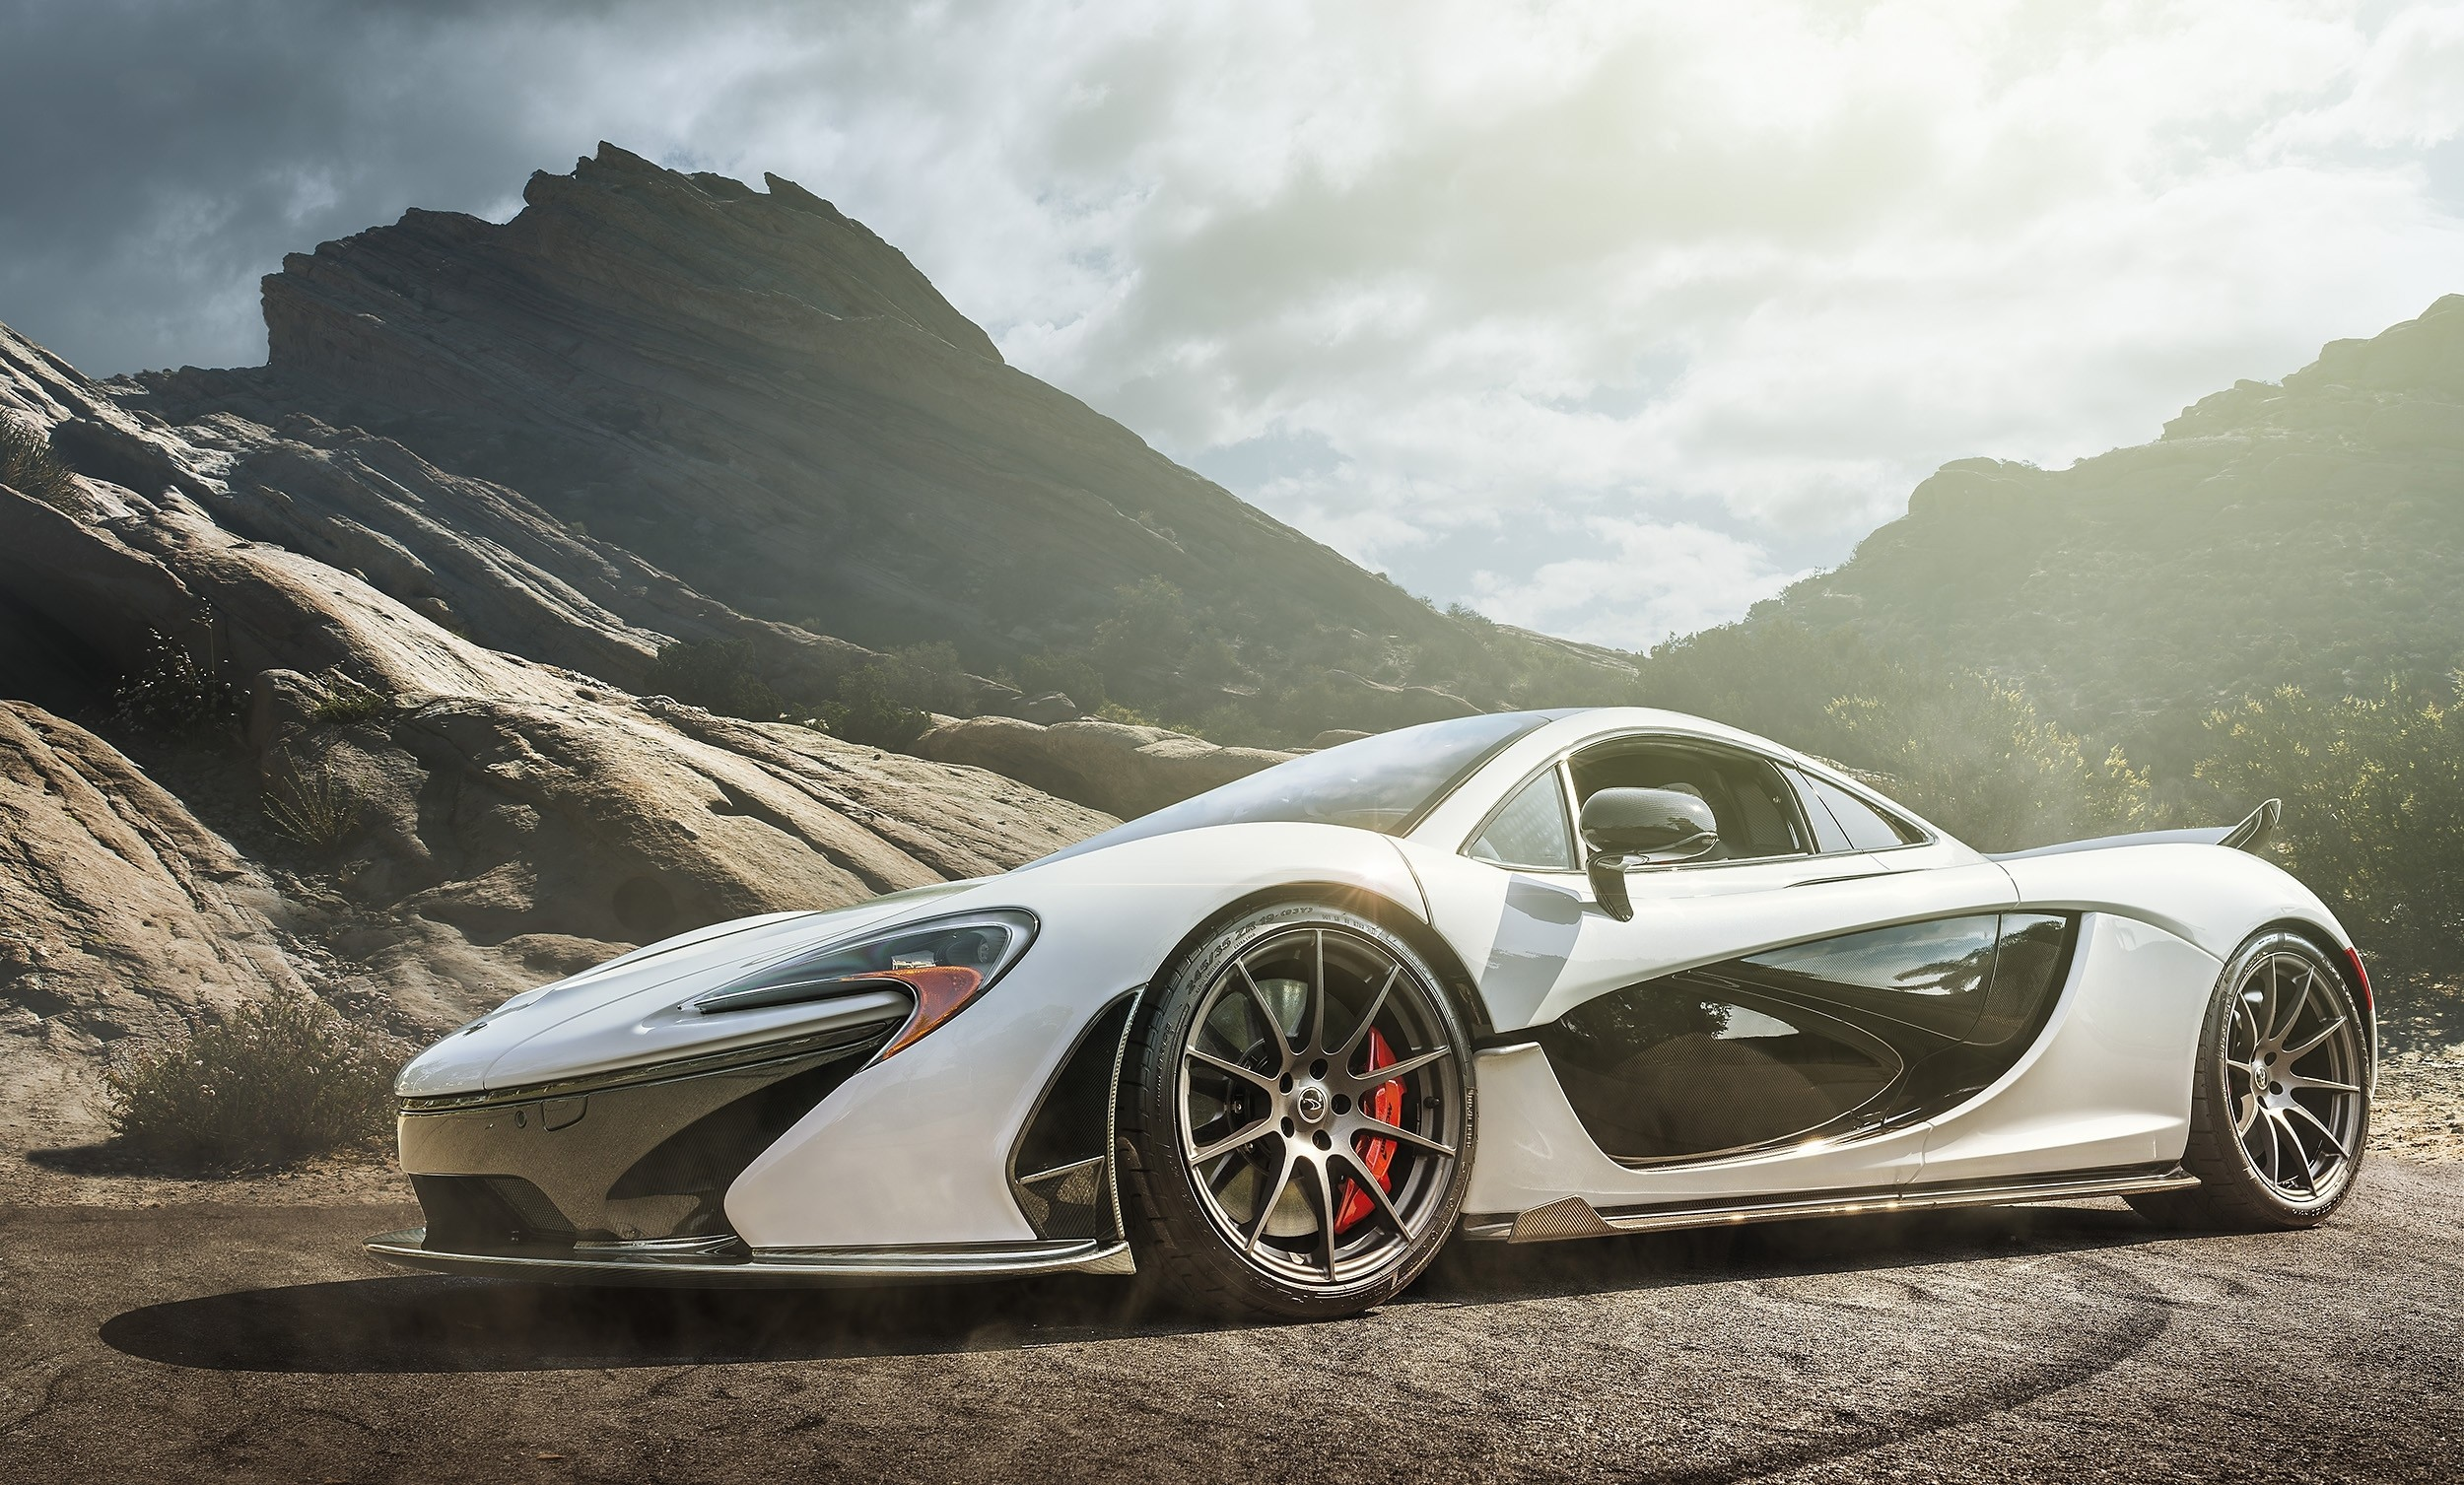 Res: 2500x1507, McLaren P1 Wallpapers HD Full HD Pictures - HD Wallpapers